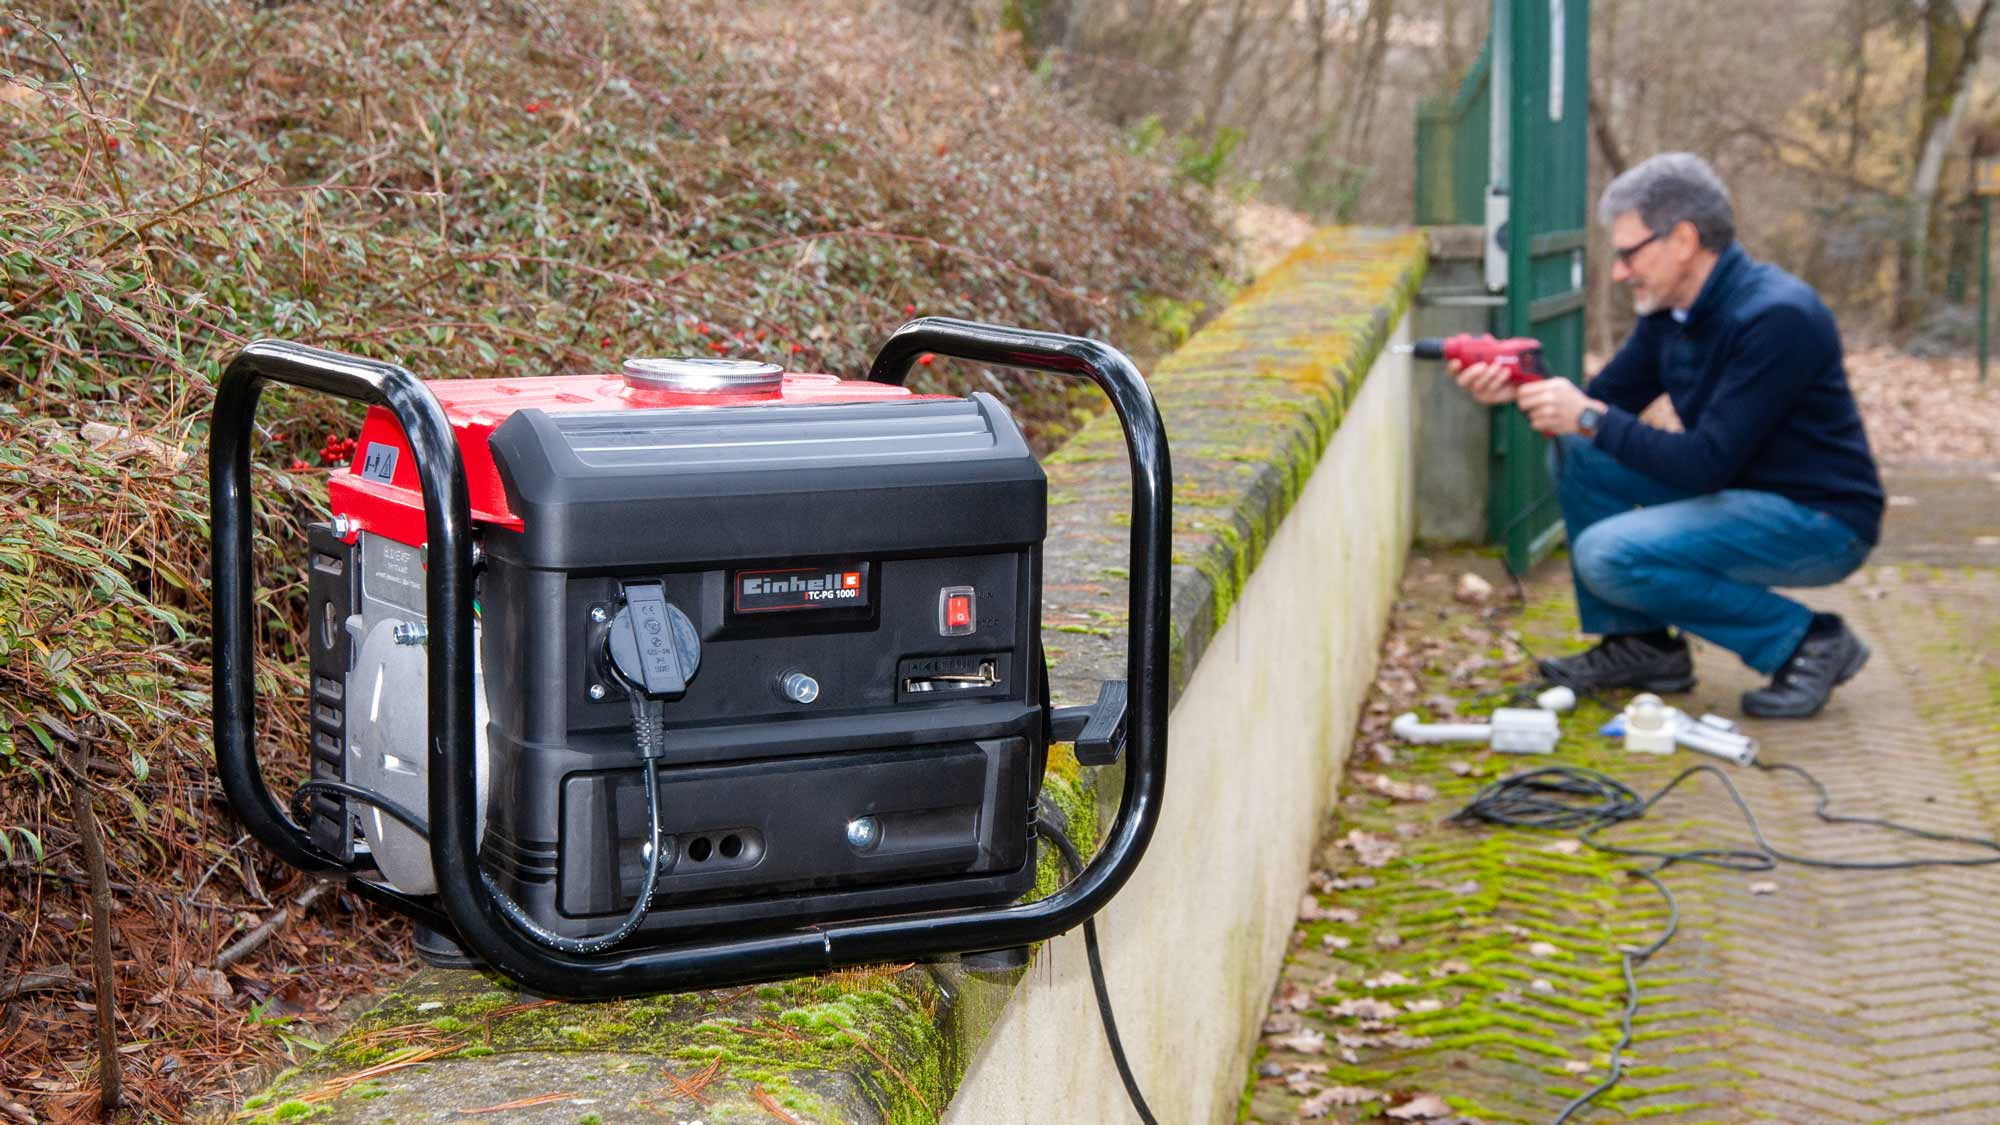 Generatore Einhell TC-PG 1000 | Mai più senza corrente elettrica